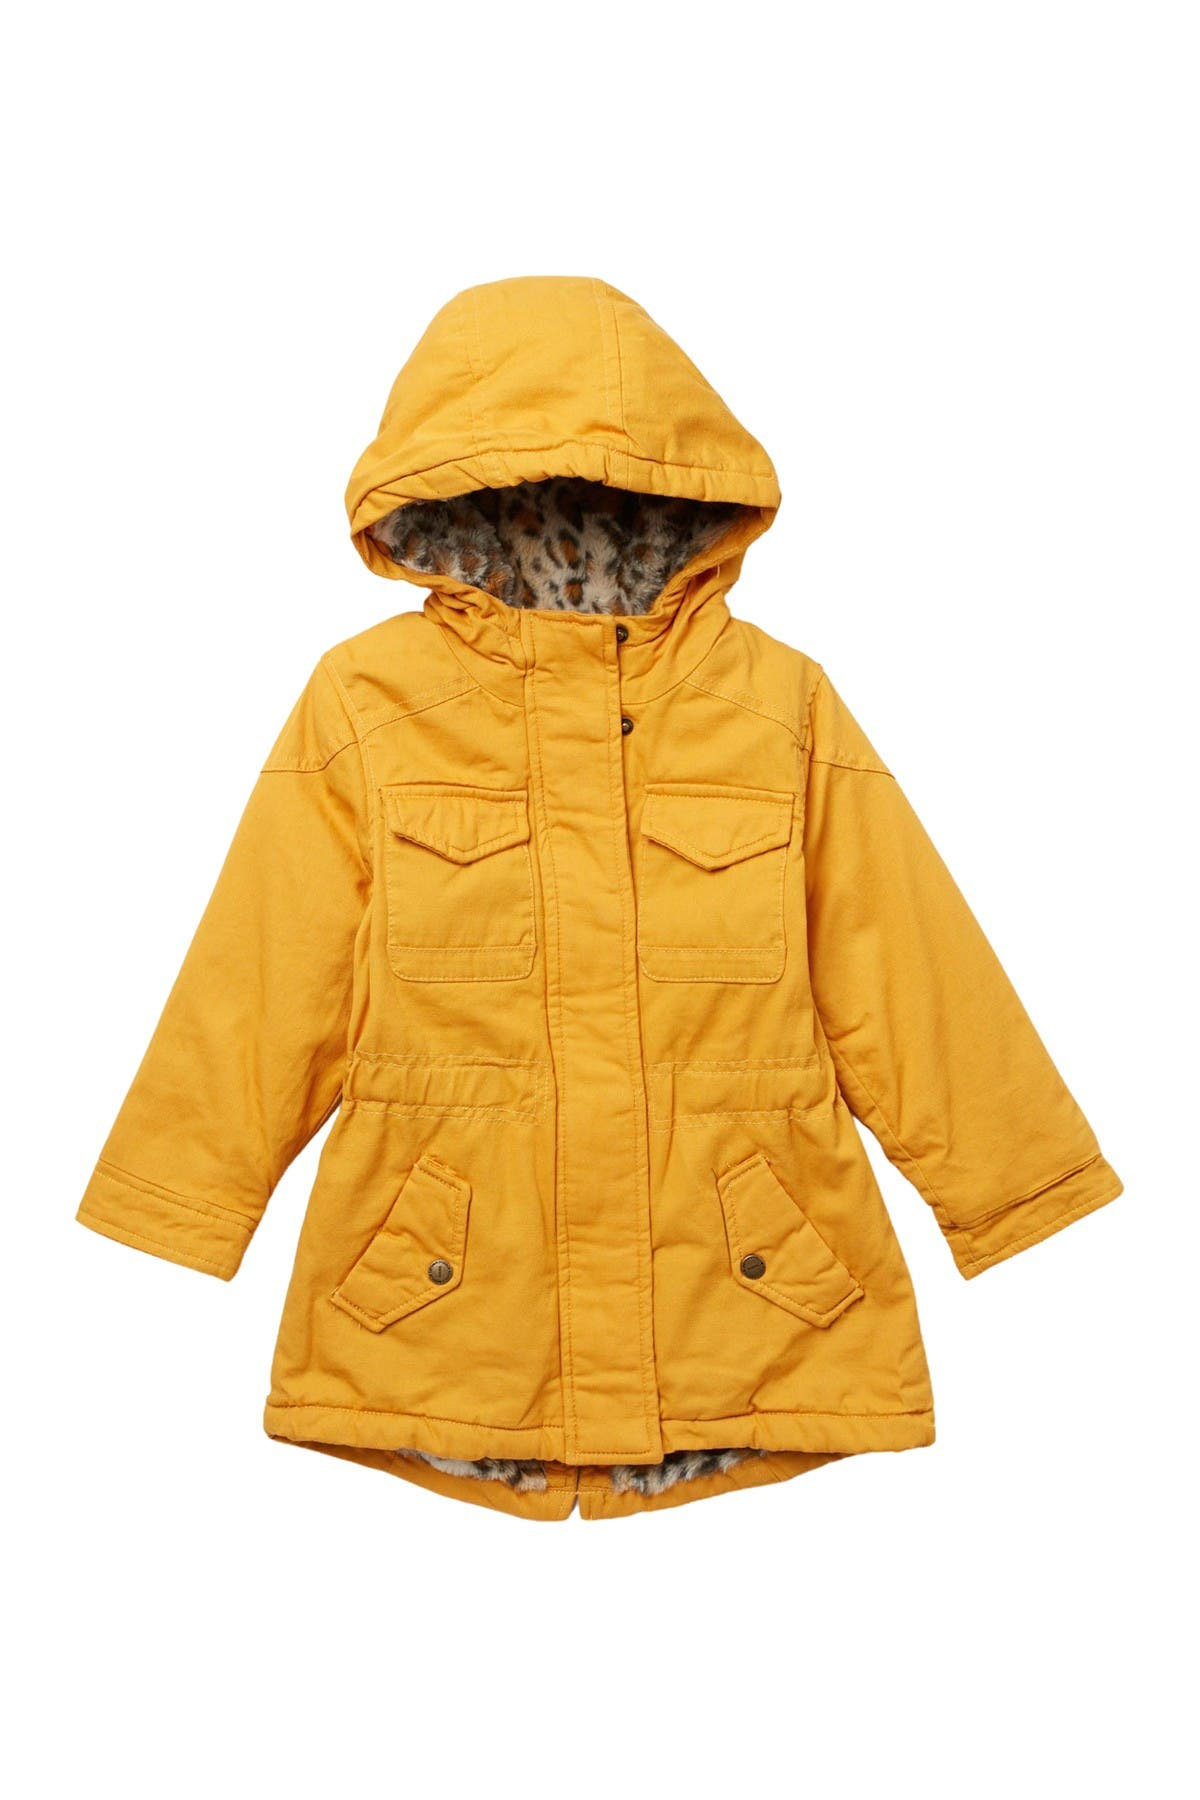 Image of Urban Republic Twill Anorak Jacket